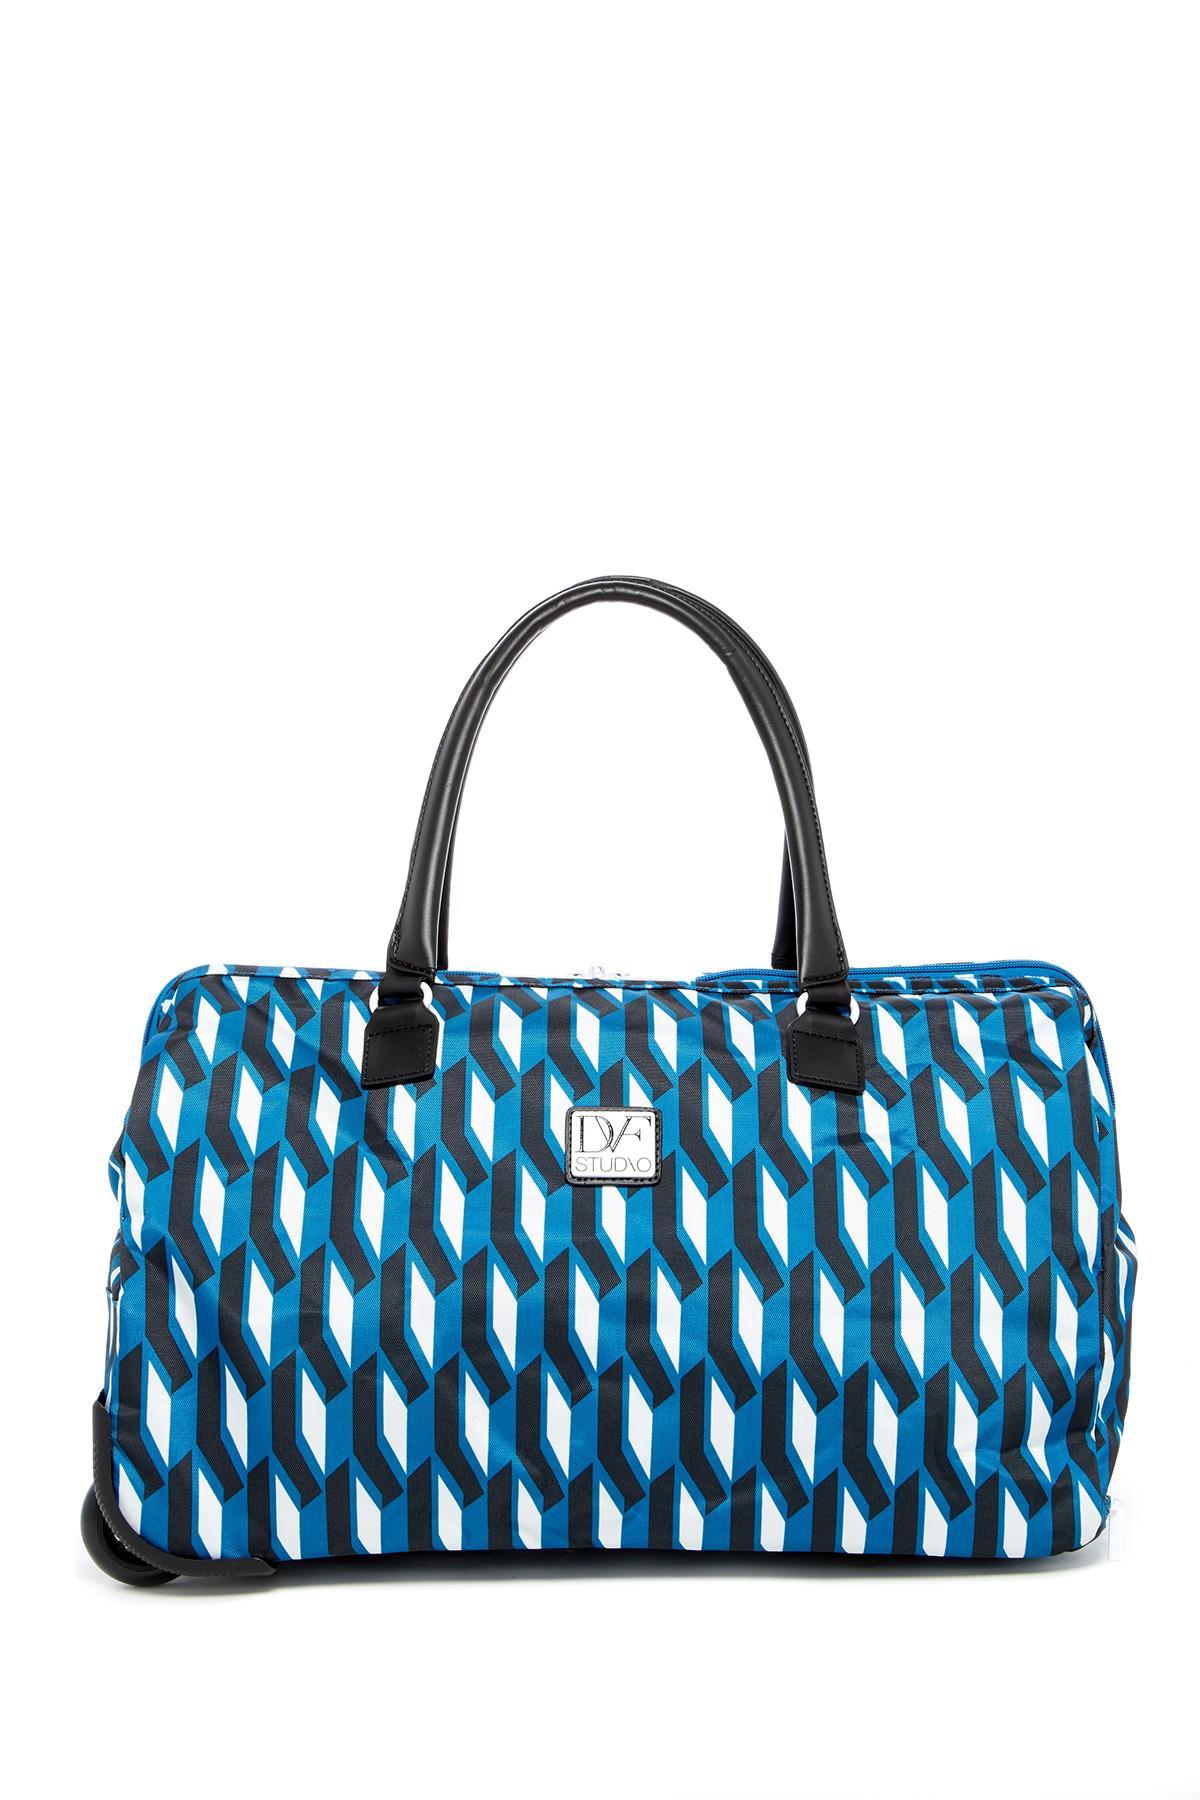 1916865b8b73 Lyst - Diane von Furstenberg Lilah Rolling Weekend Bag in Blue